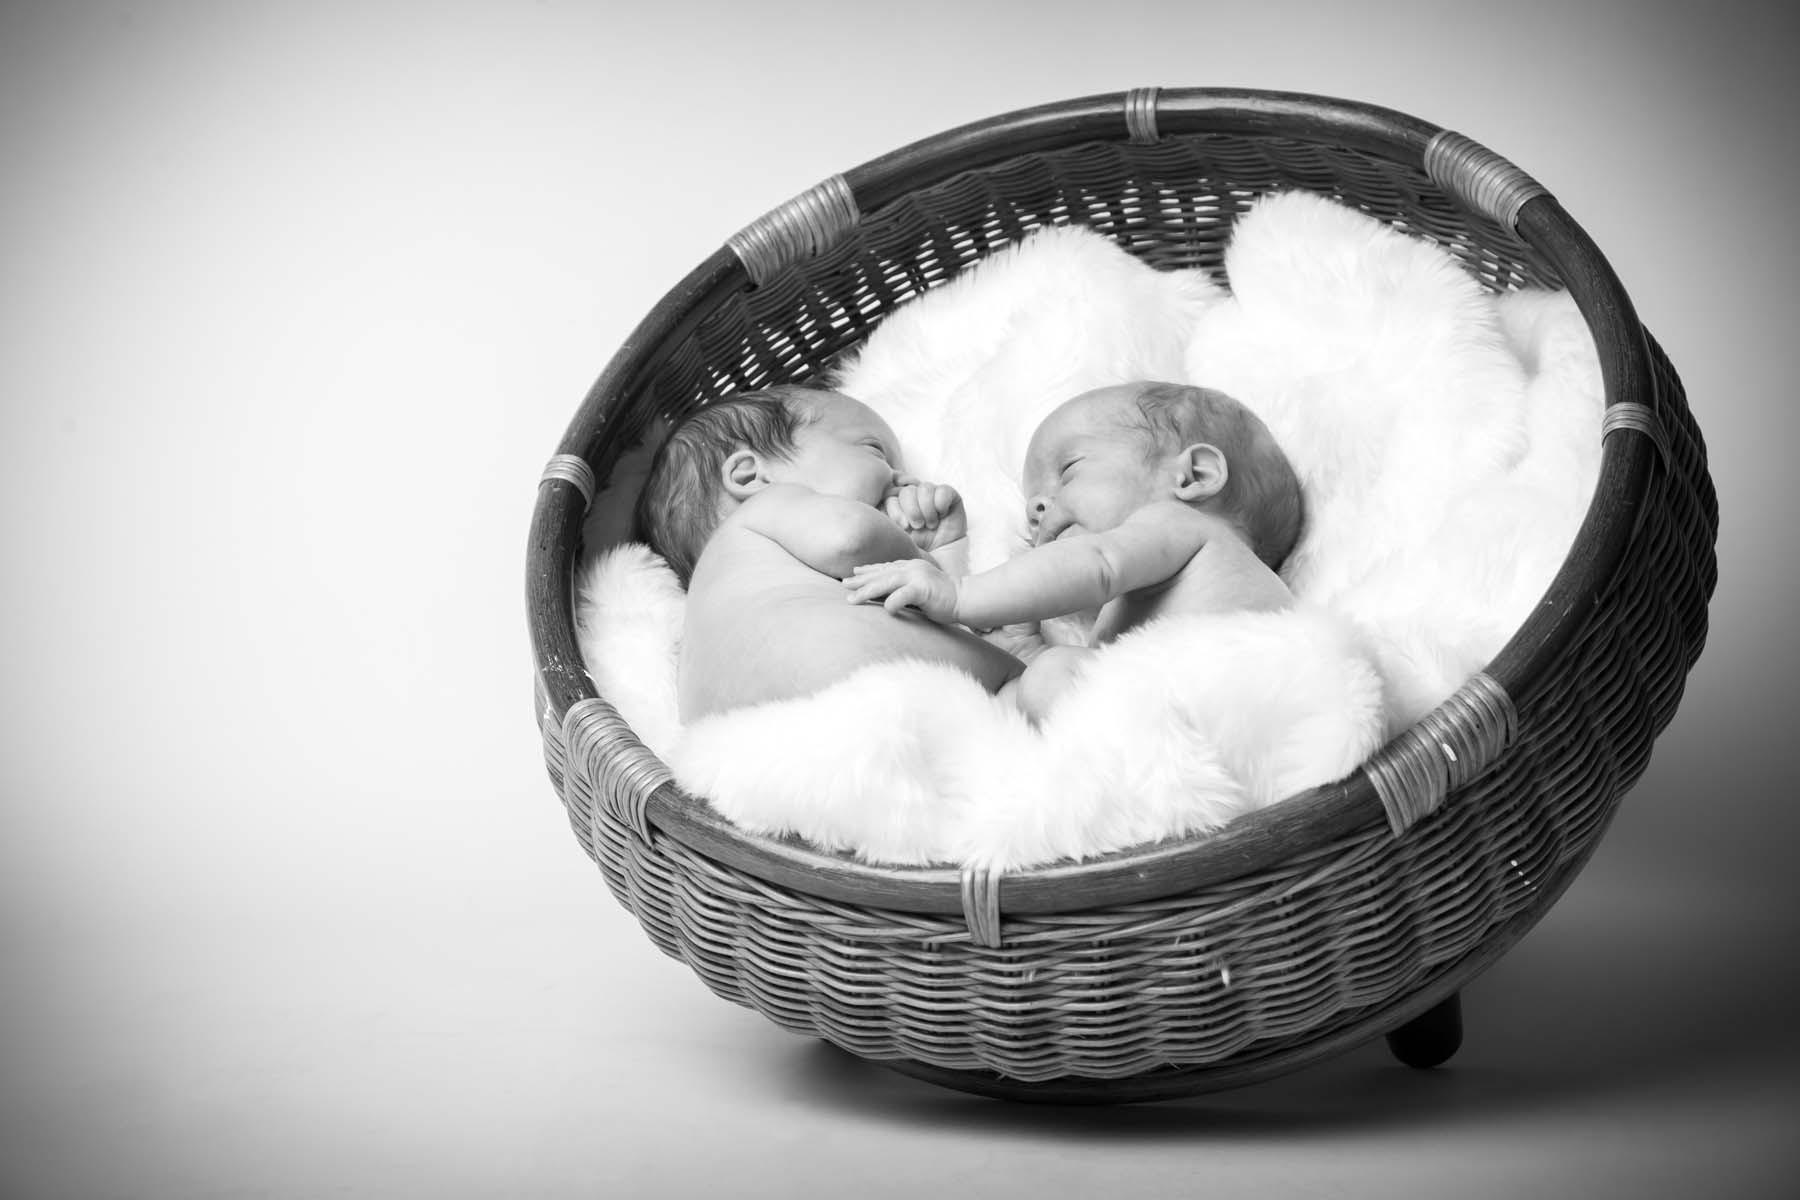 Newborn Baby Photographer in Sussex & Surrey, East Grinstead & Crawley (12)